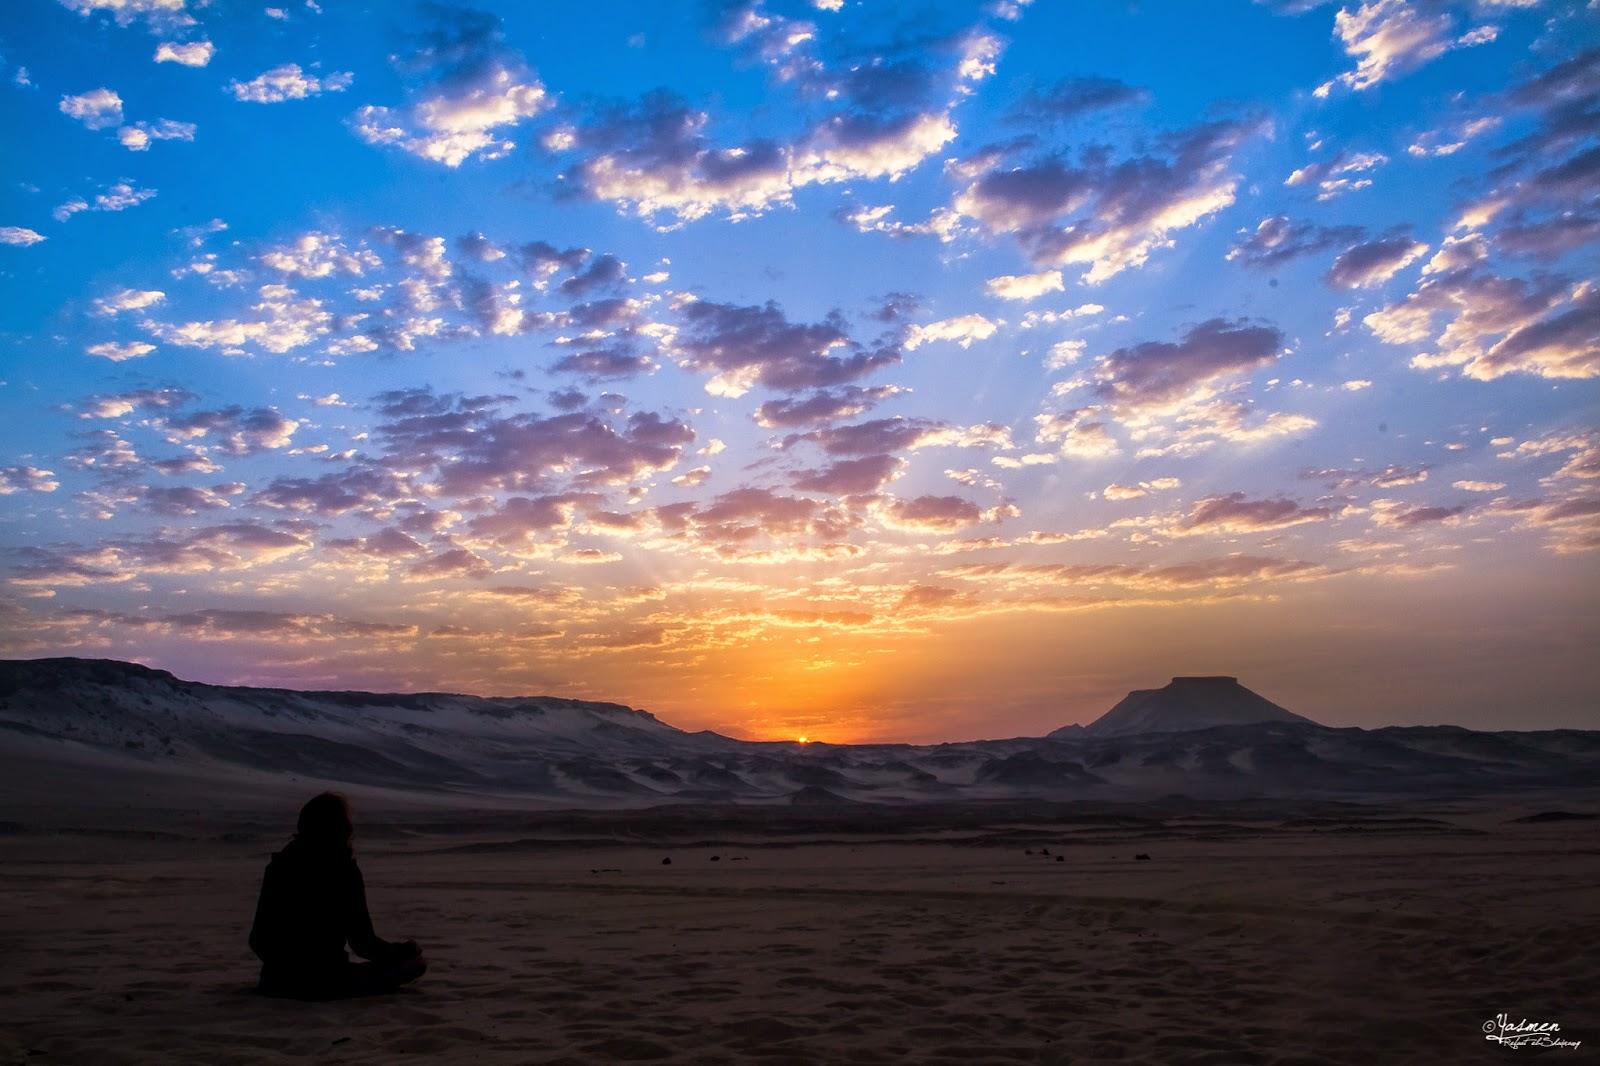 Sunrise at Bahariya Oasis Desert - Yasmen Refaat El-Shaa'rawy